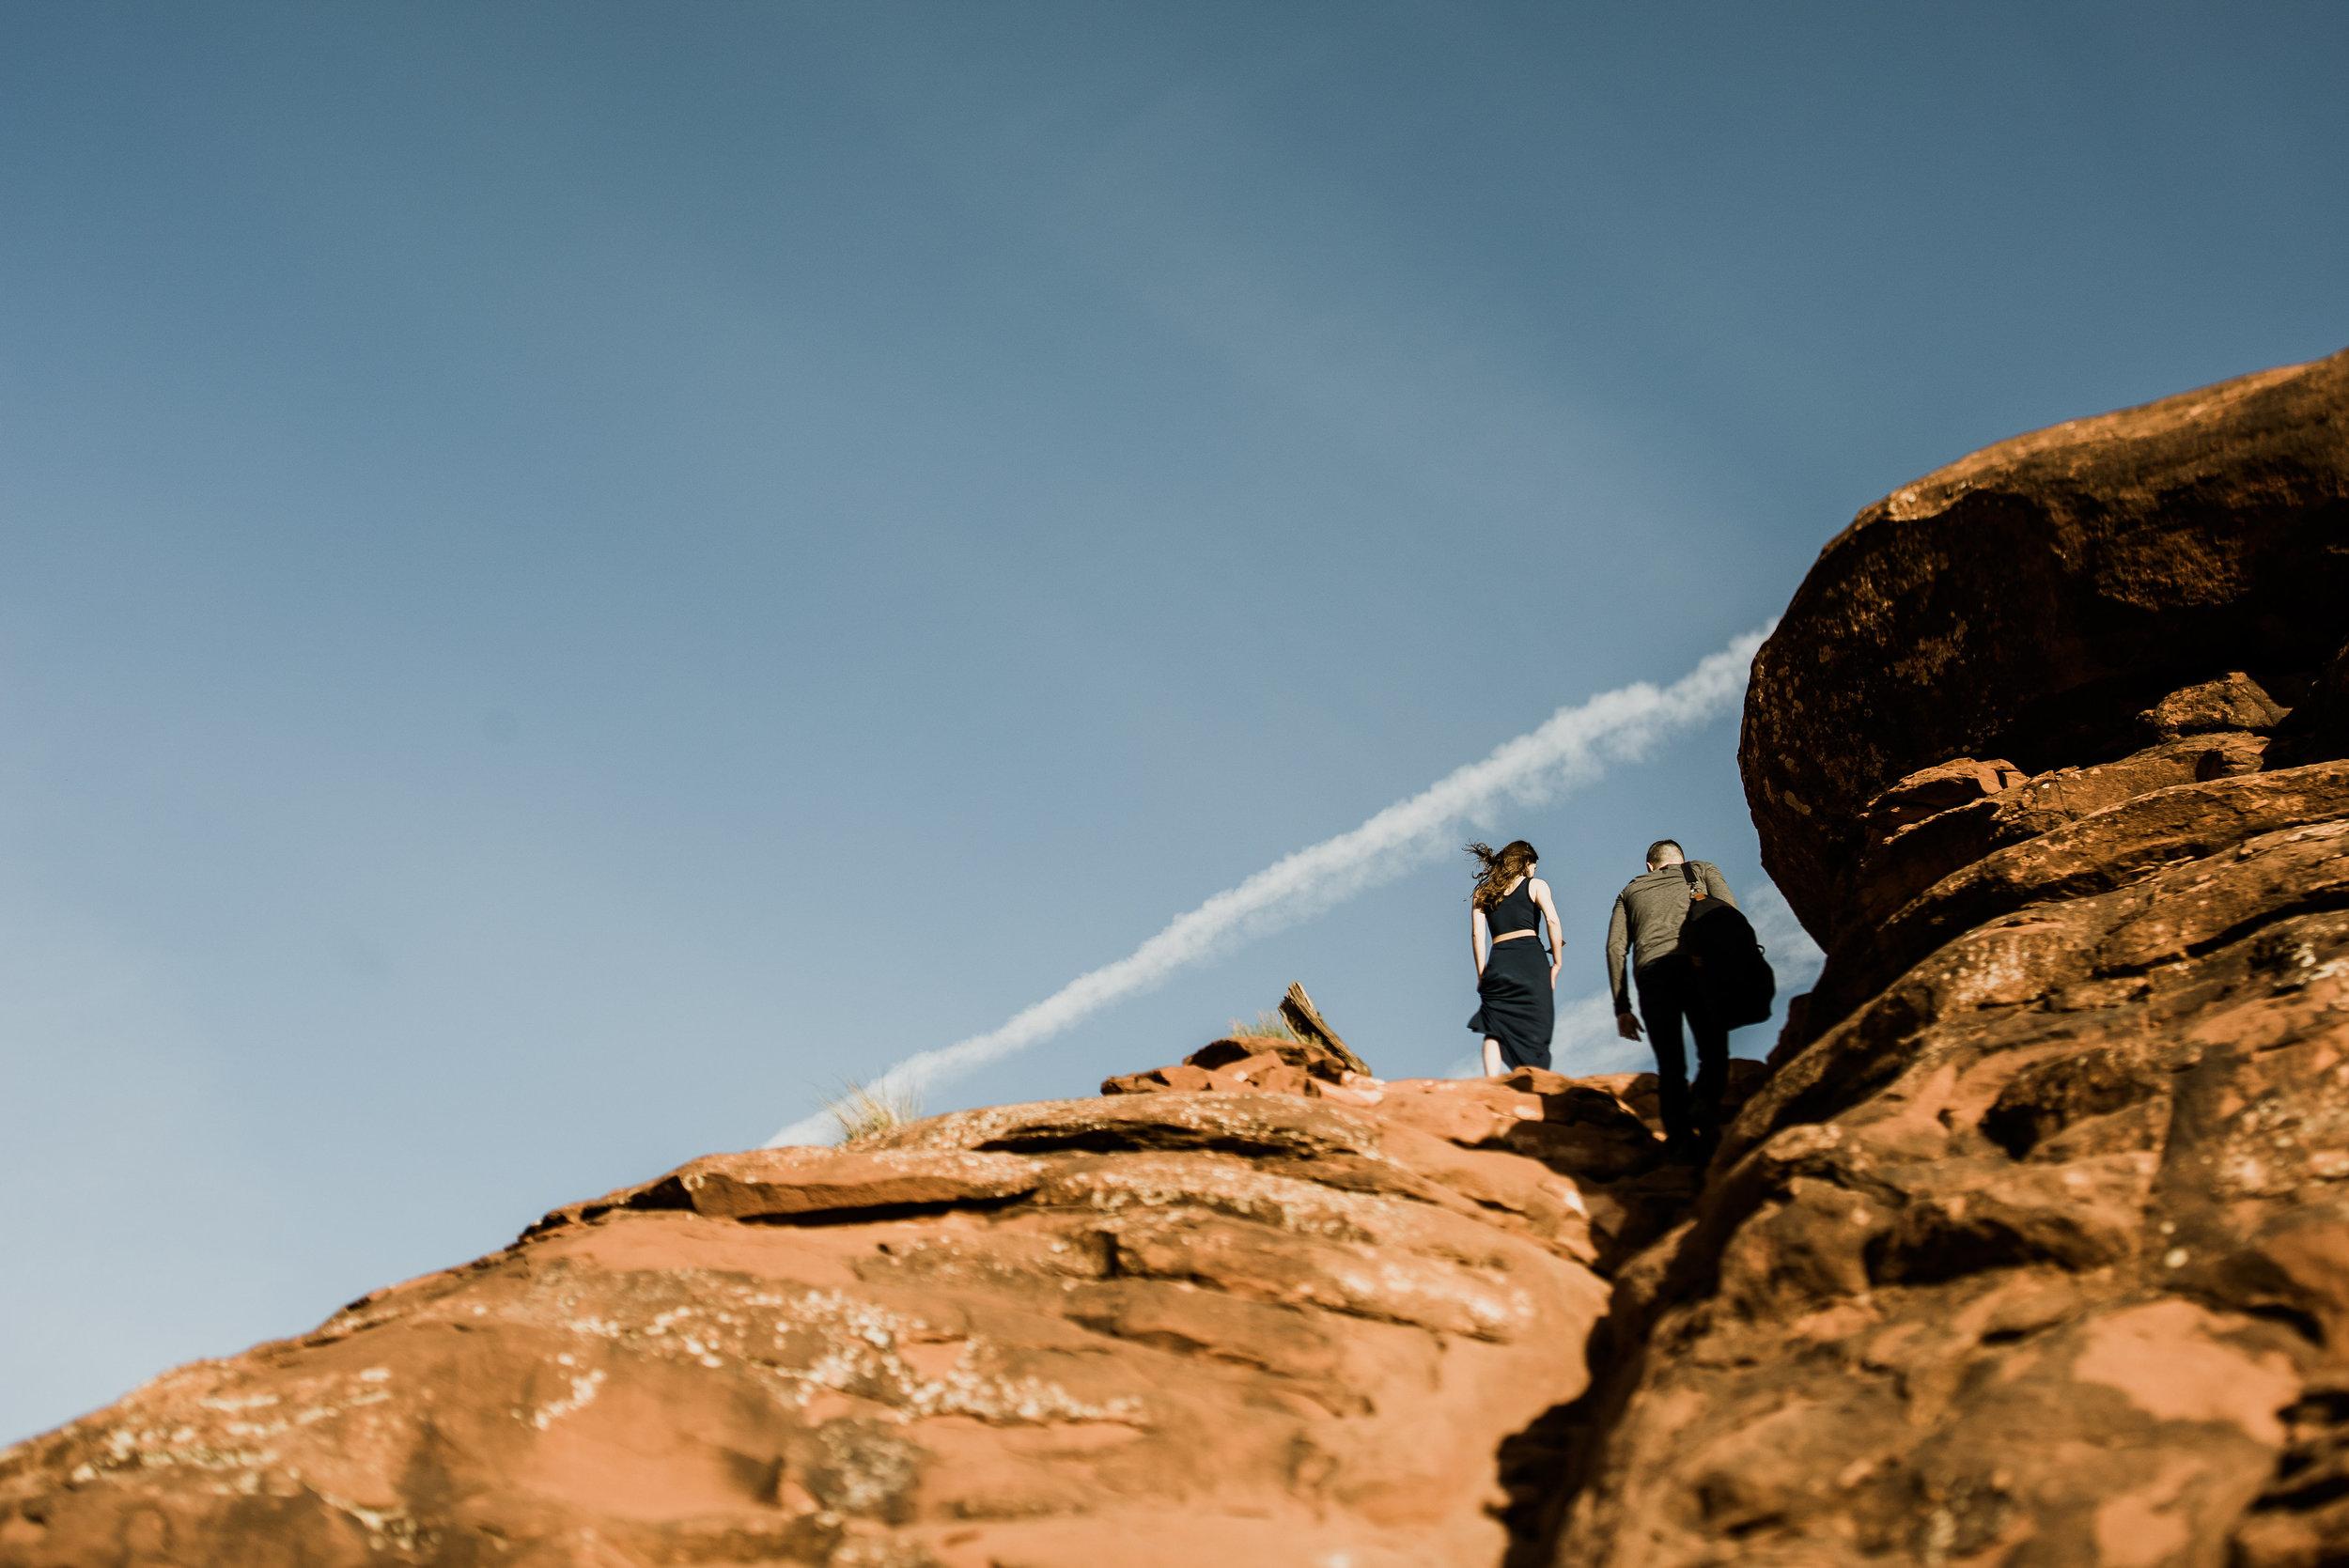 Isaiah-&-Taylor-Photography---Paul-&-Karen-Engagement,-Sedona-Arizona-045.jpg